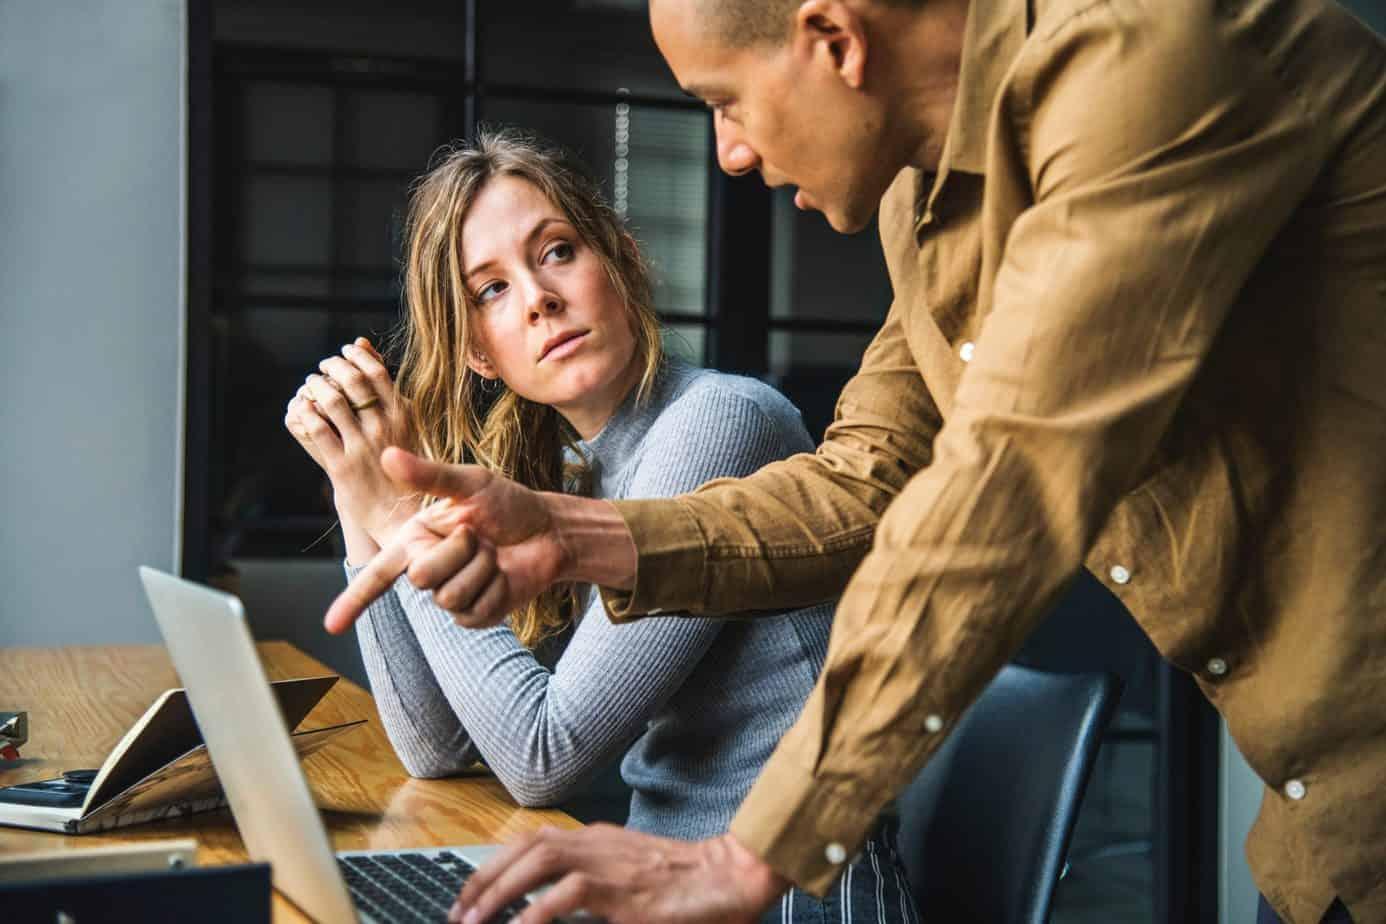 Mobbing am Arbeitsplatz: Frau wird kritisiert